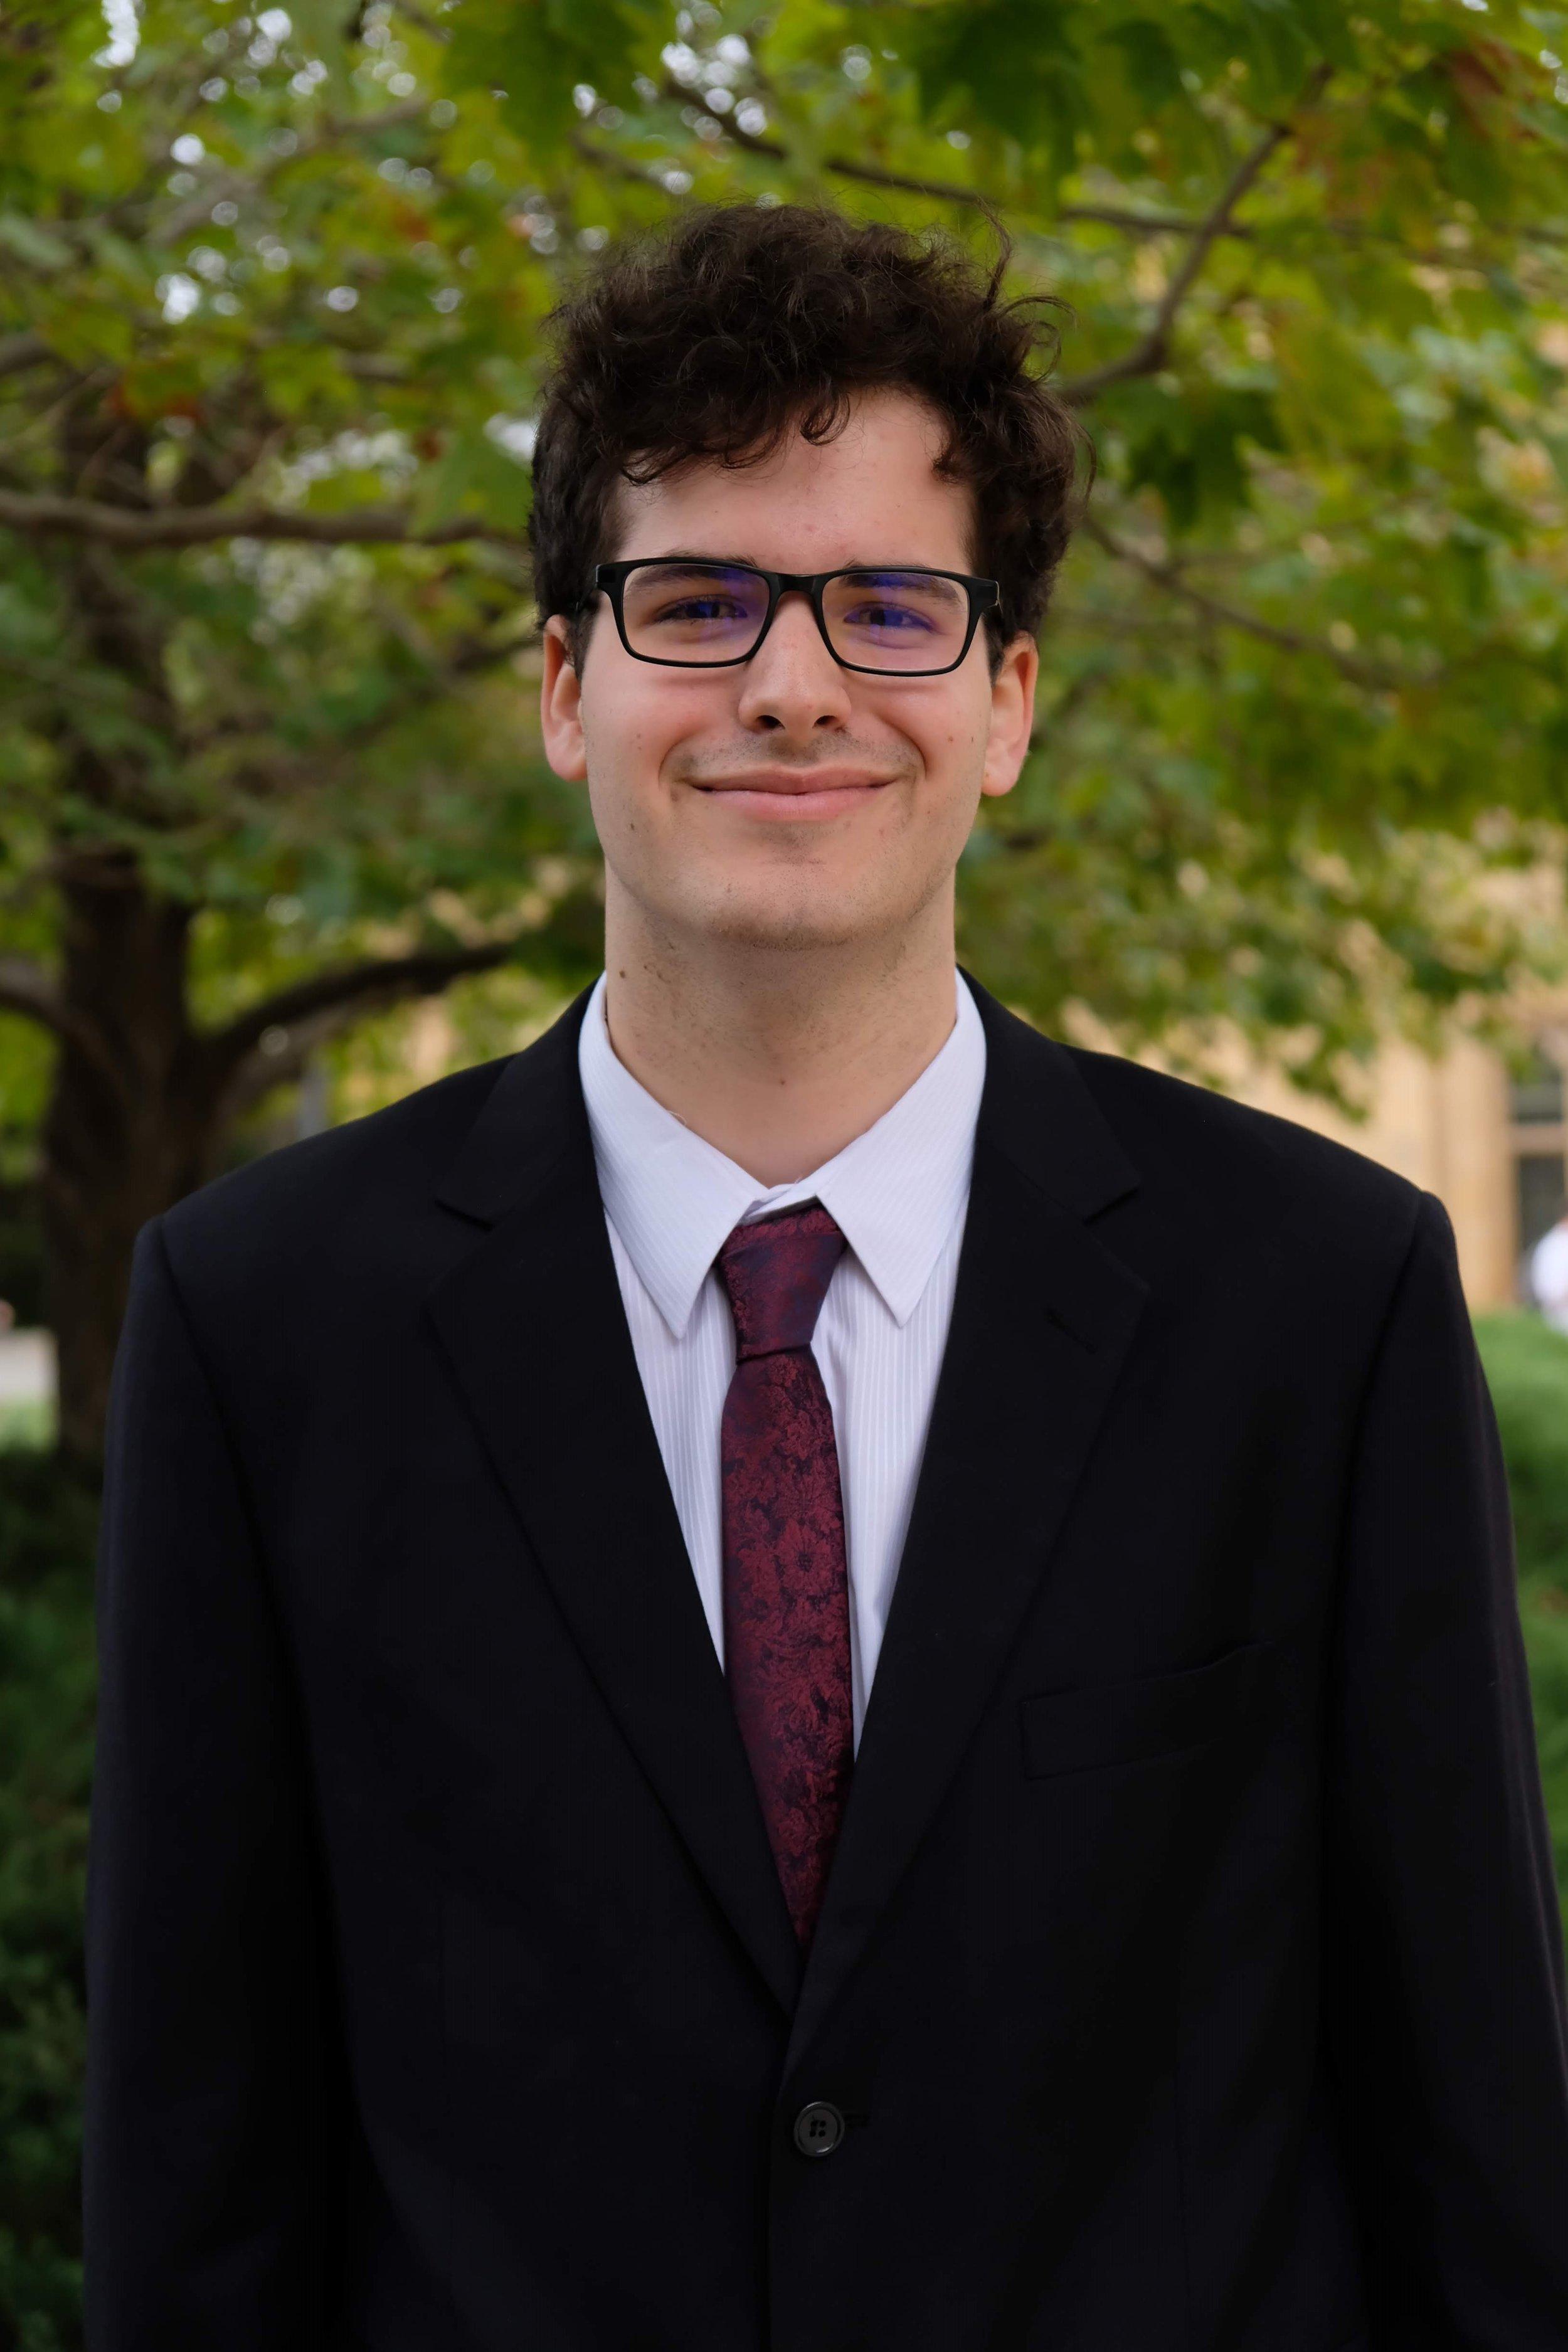 Ben Griffiths - National Affairs Director